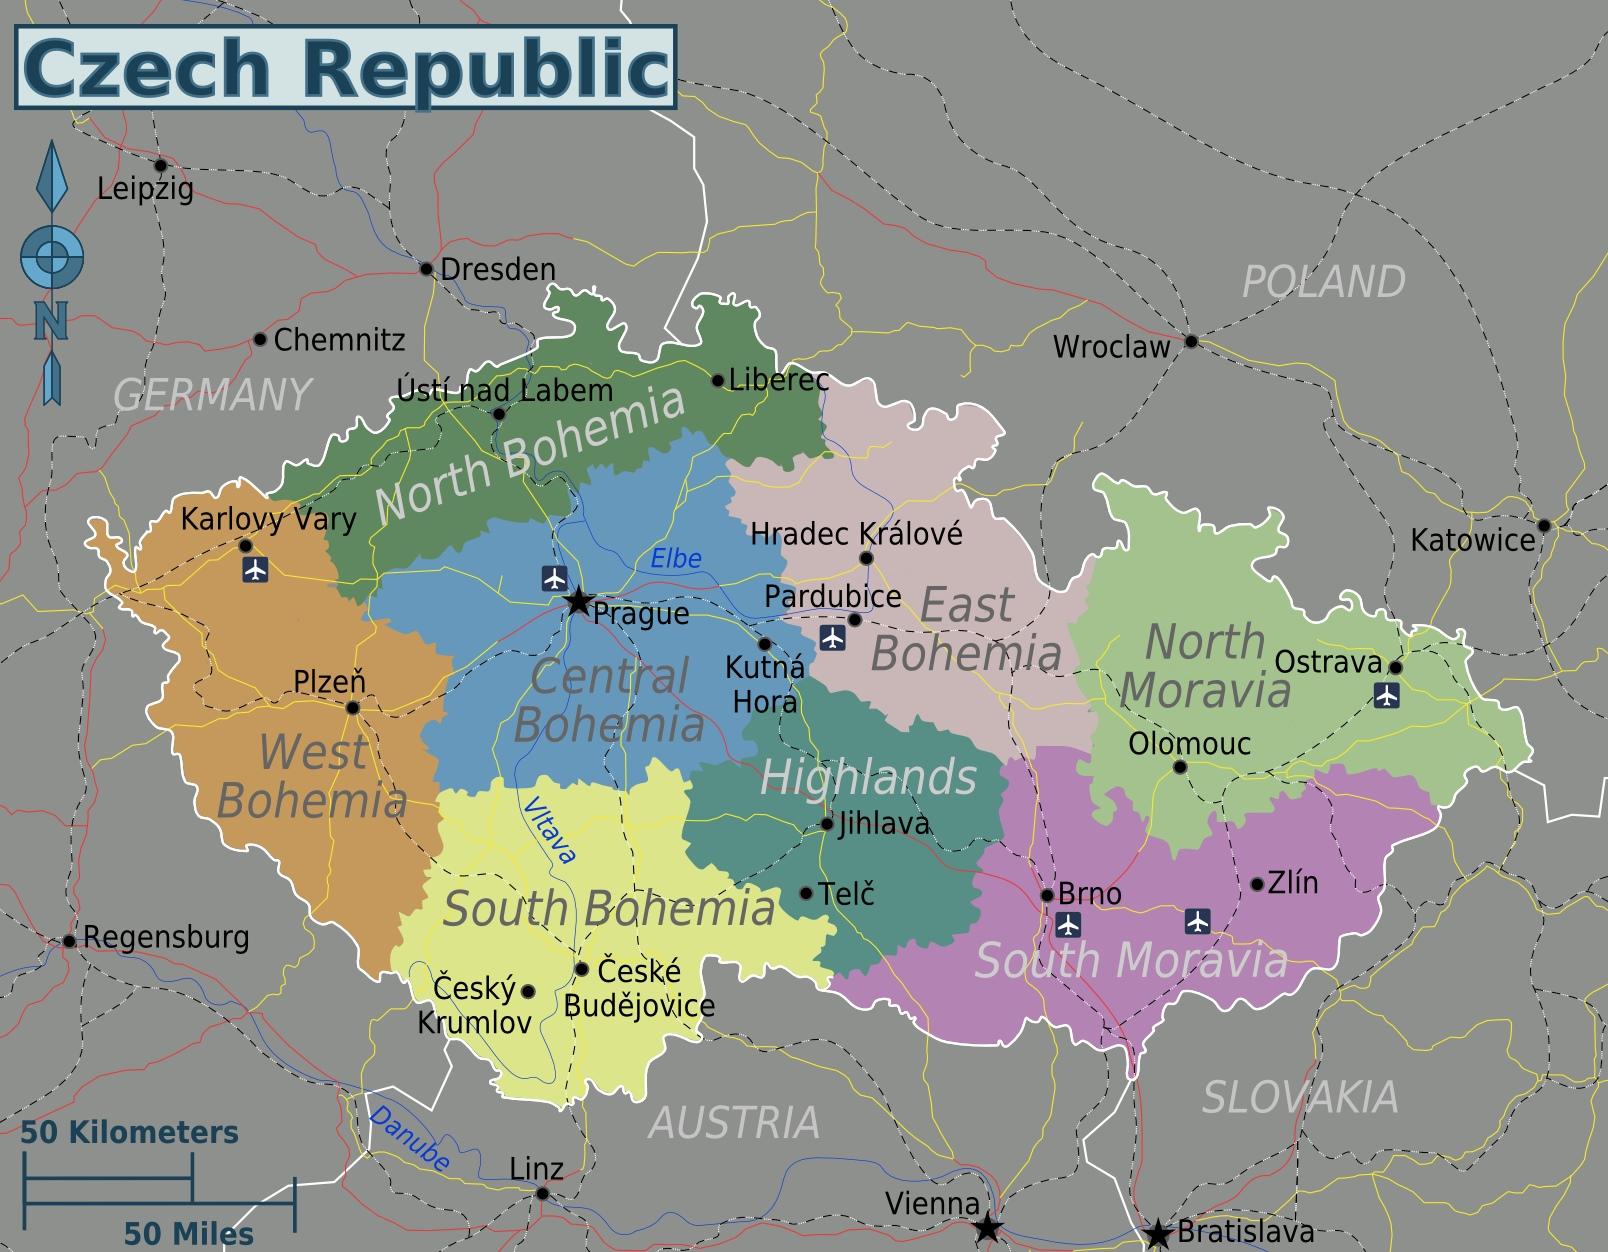 Country - Czech Republic